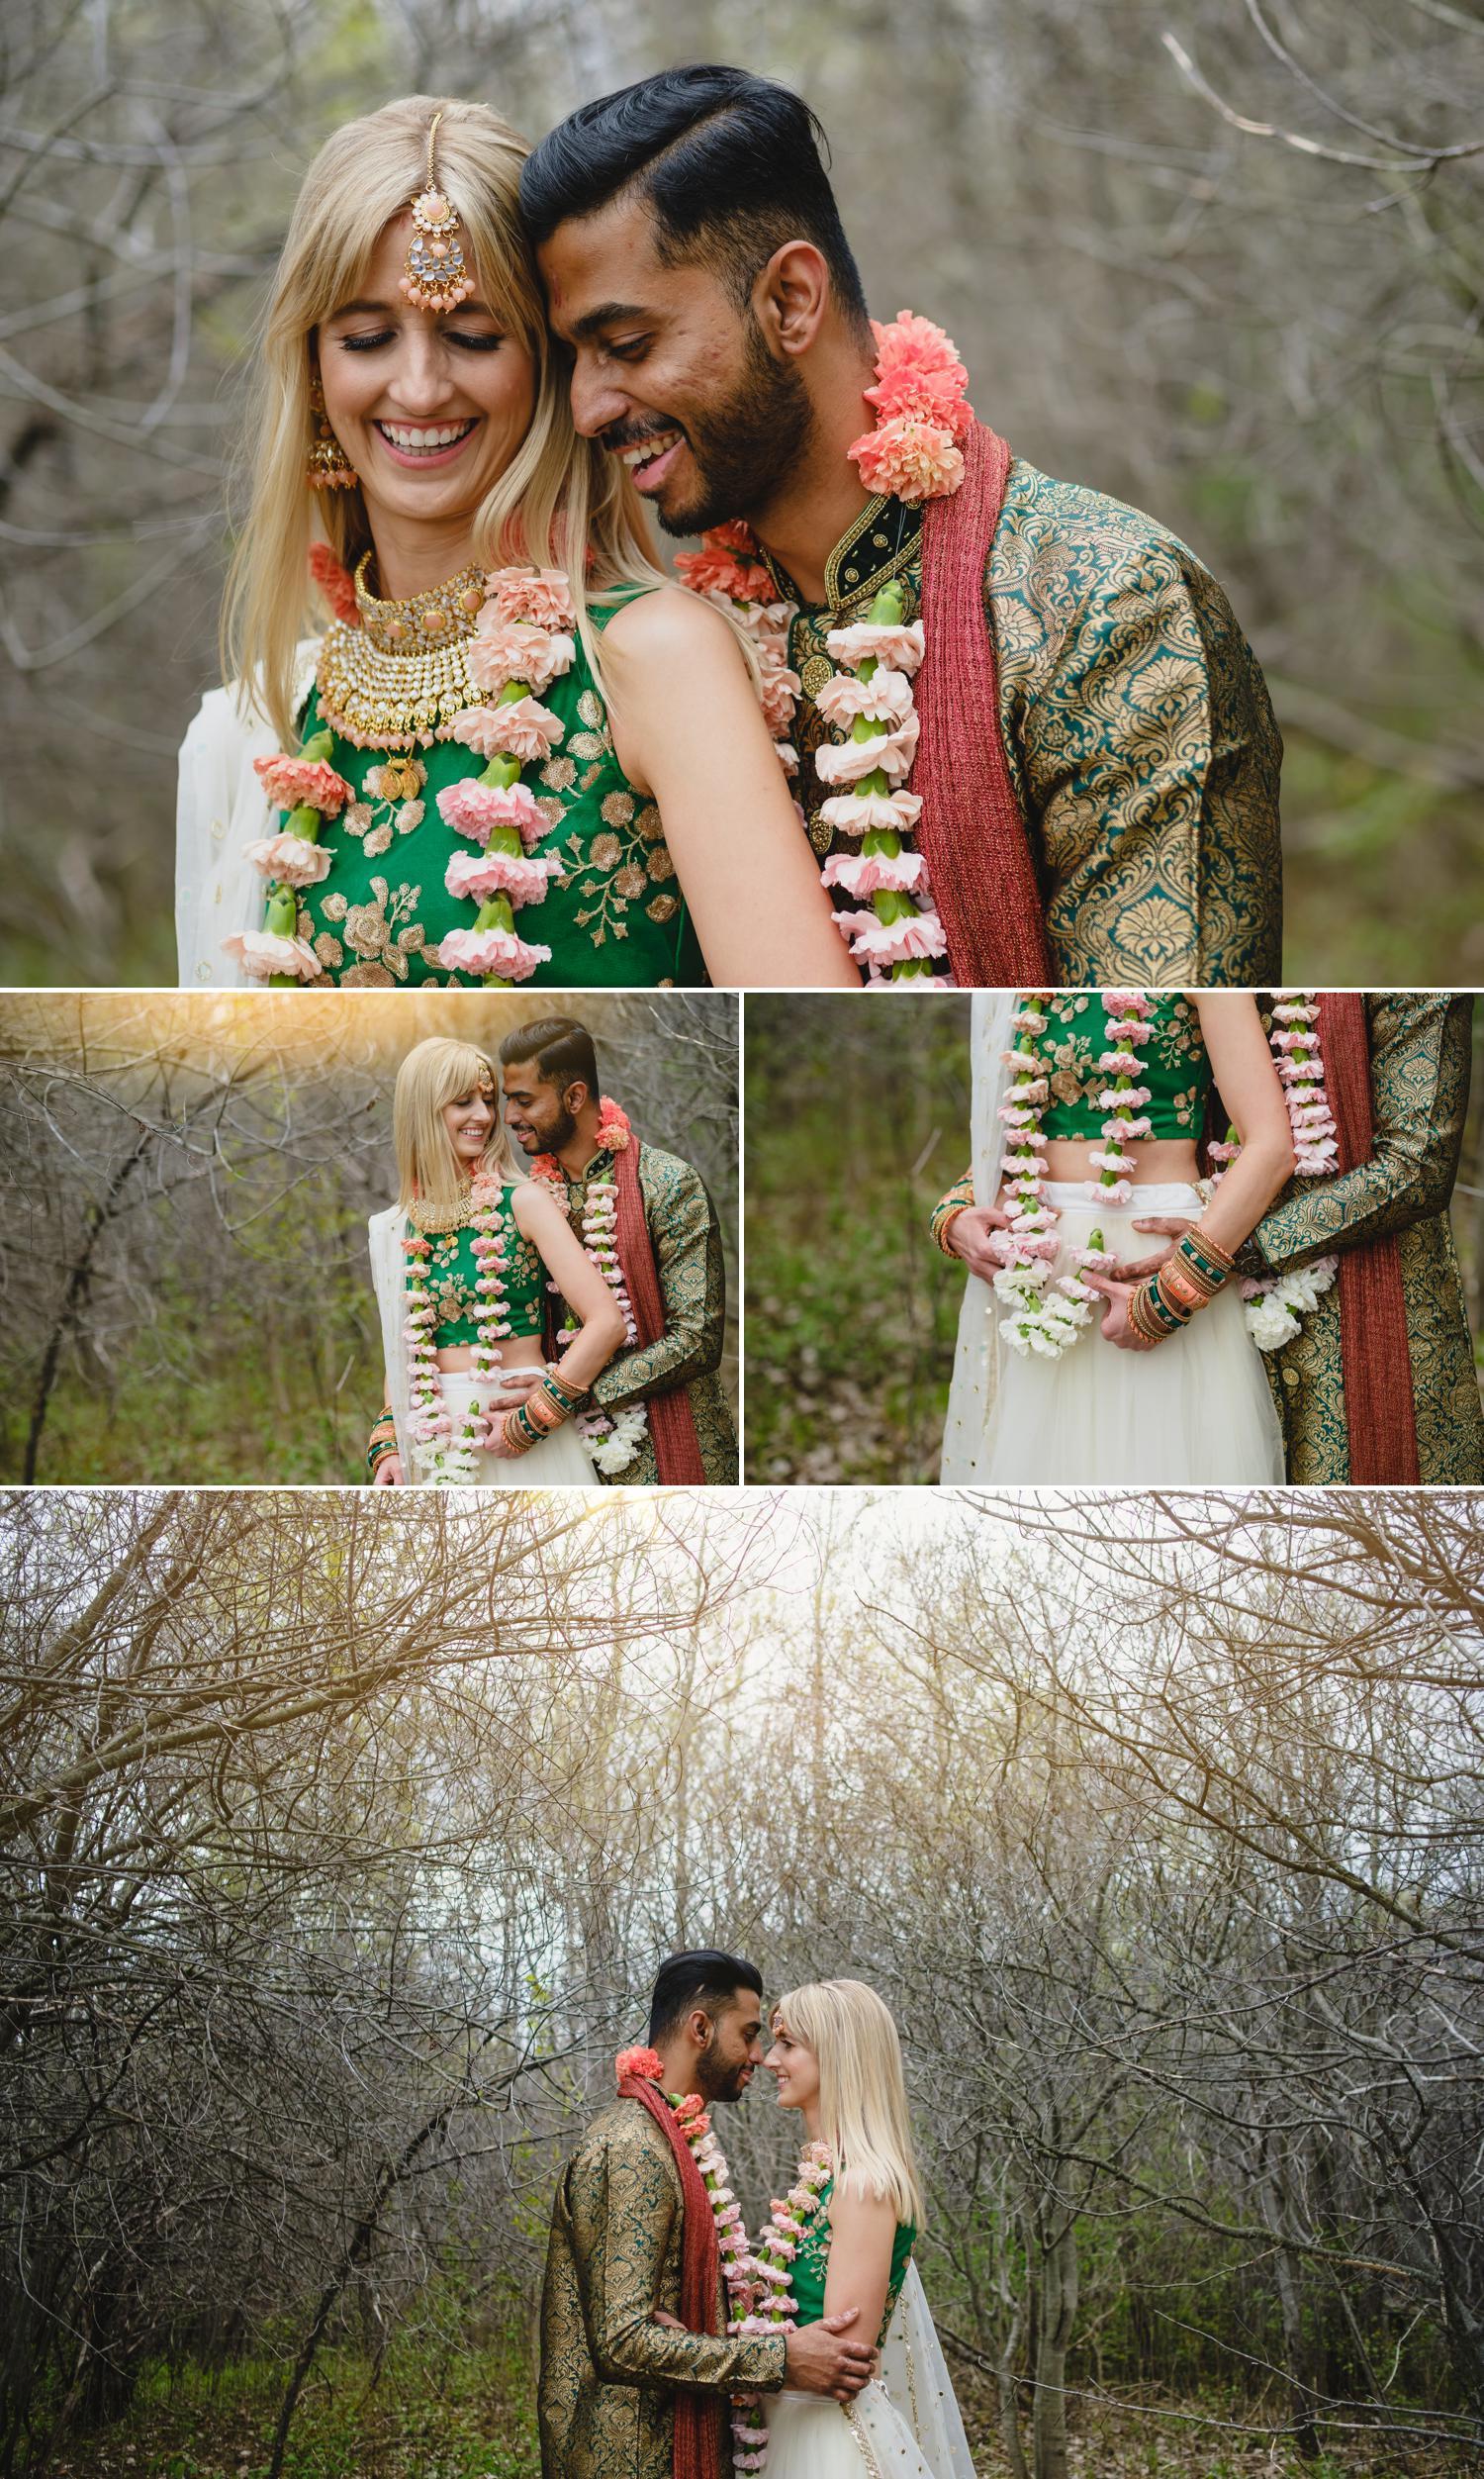 photos of a bride and groom outside aquatopia in ottawa